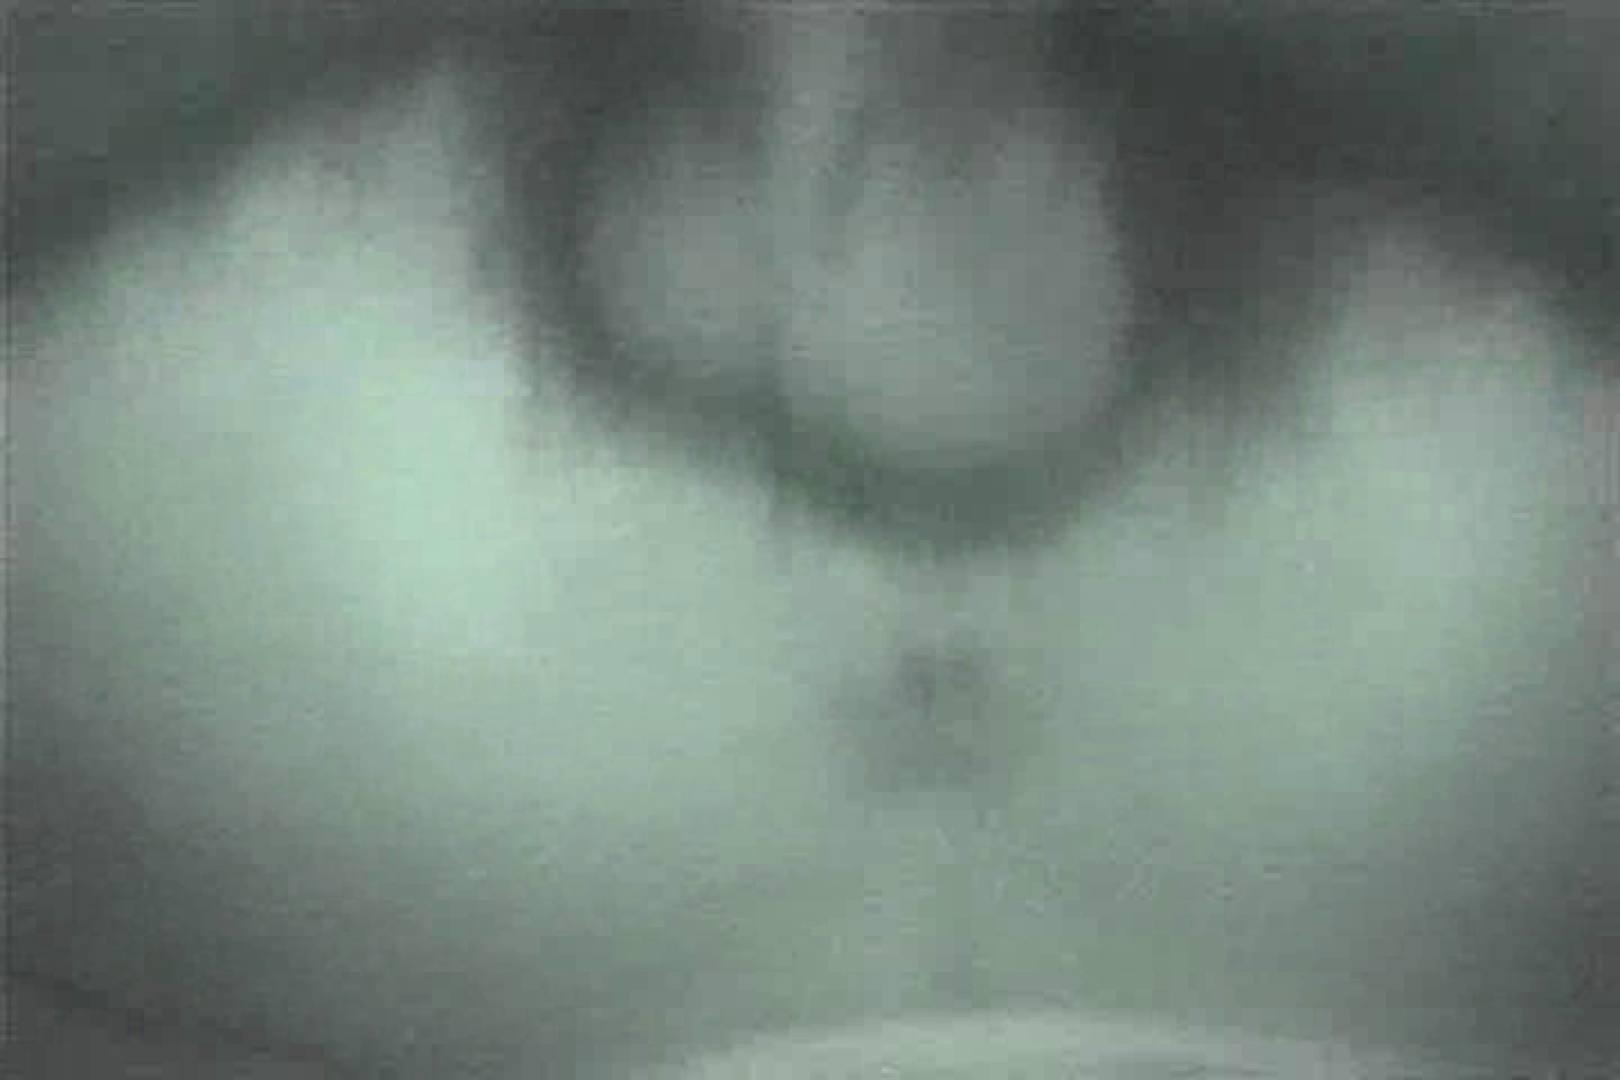 MASAさんの待ち伏せ撮り! 赤外線カーセックスVol.19 赤外線 のぞき濡れ場動画紹介 89画像 18